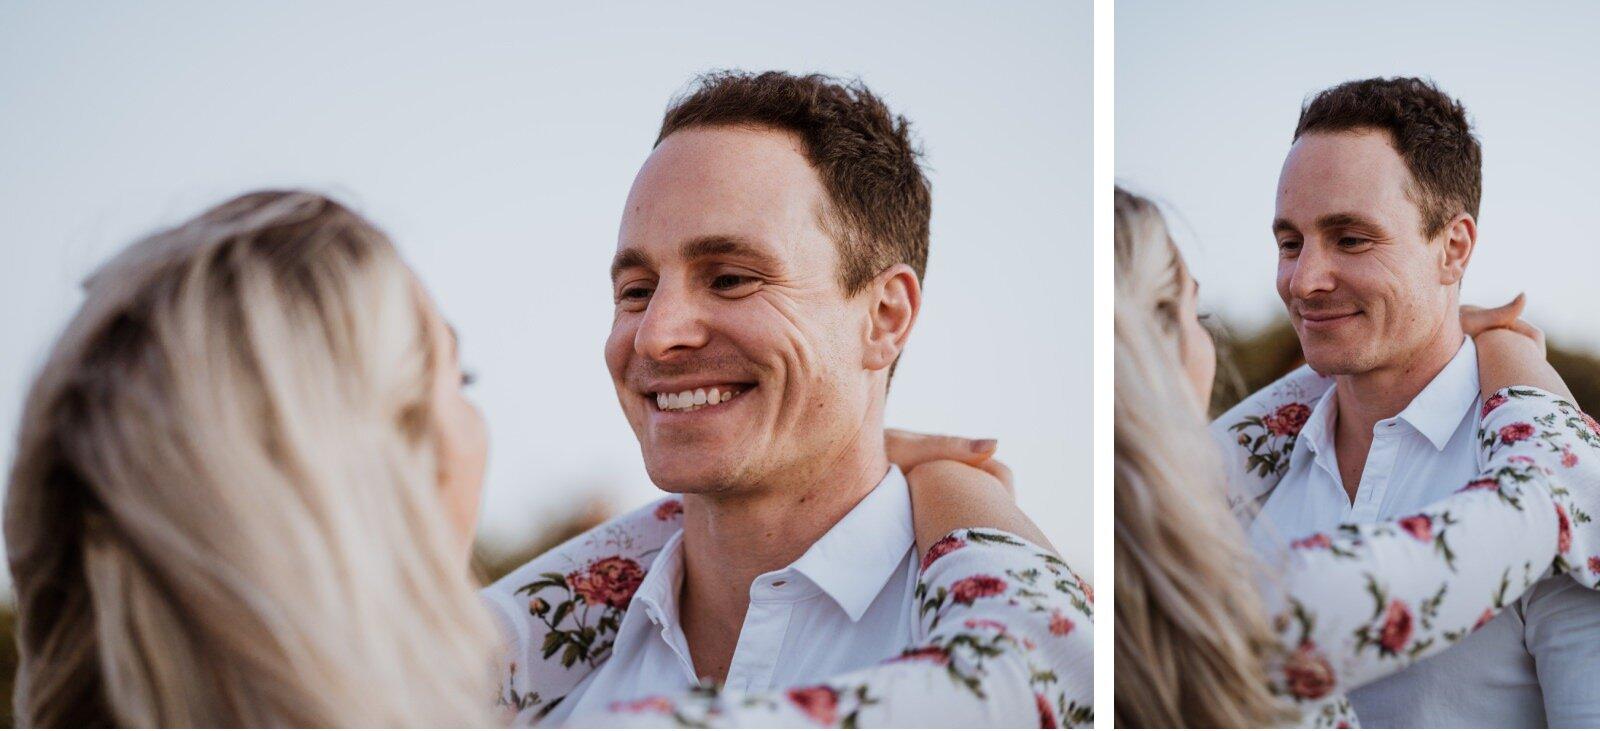 newcastle-wedding-photographer-dudley-engagement-shoot-35.jpg